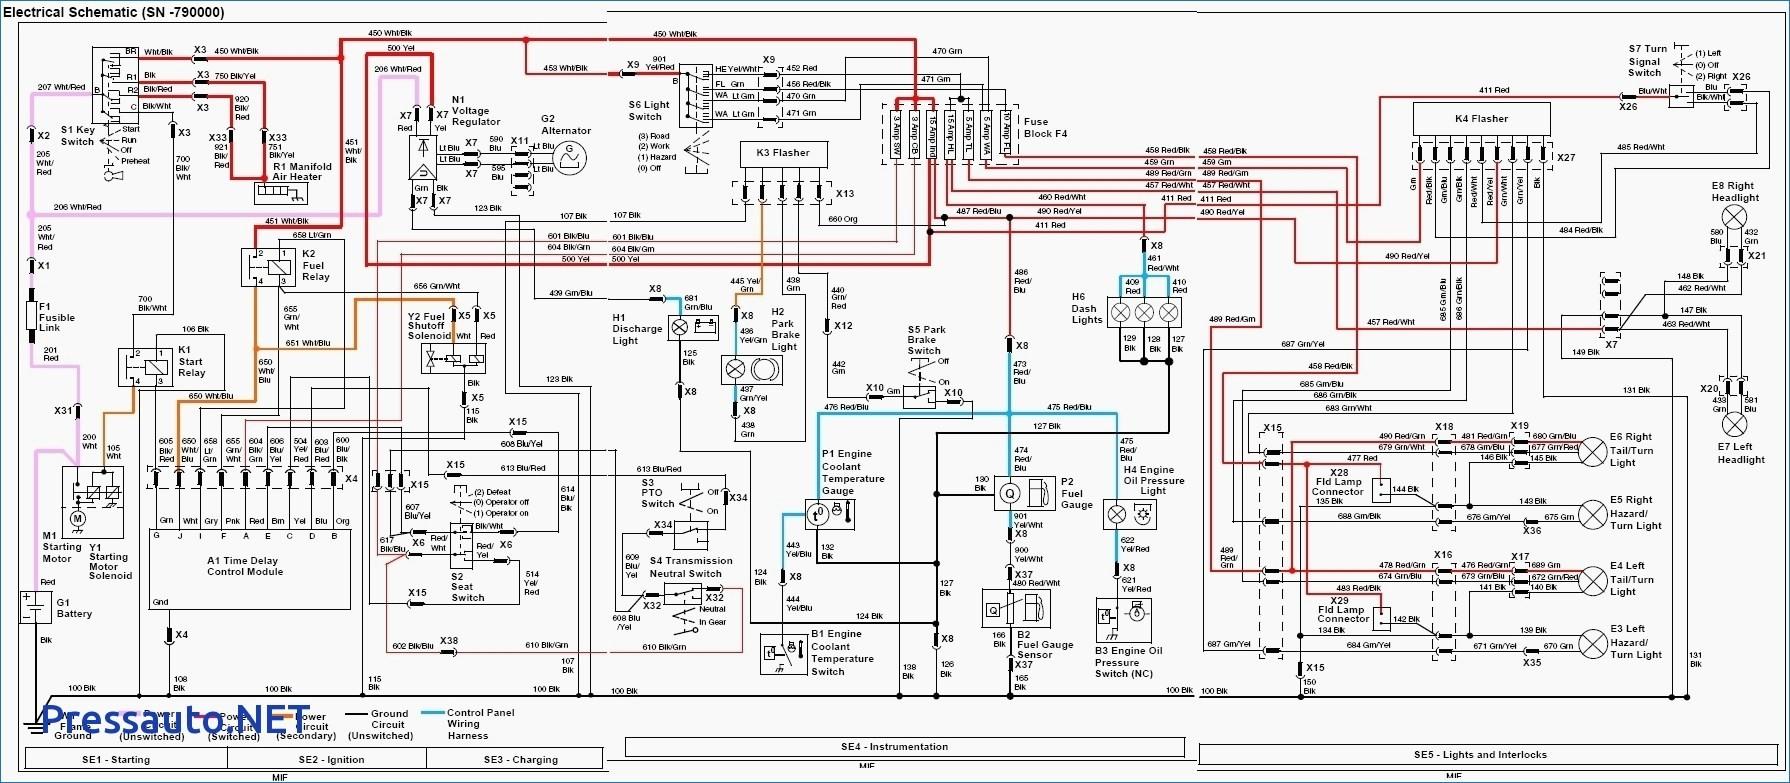 John Deere Diagram - Wiring Diagram Meta on john deere 160 electrical wiring, bolens lawn tractor wiring diagram, john deere 4020 tractor schematic, john deere 60 tractor wiring for model a, john deere 112 wiring-diagram, john deere 445 wiring-diagram, scott's lawn tractor engine diagram, john deere l100 wiring-diagram, john deere 24 volt wiring diagram, john deere 1010 tractor wiring, john deere a wiring diagram for 1100, john deere 265 wiring diagram, john deere 214 wiring-diagram, john deere tractor wiring system, john deere 316 wiring-diagram, john deere 3020 diesel 2 6 volt batteries wiring diagram to starter, 4020 12 volt alternator wiring diagram, john deere tractor wiring schematics, john deere 4020 wiring diagram, for john deere 1050 tractor wiring diagram,